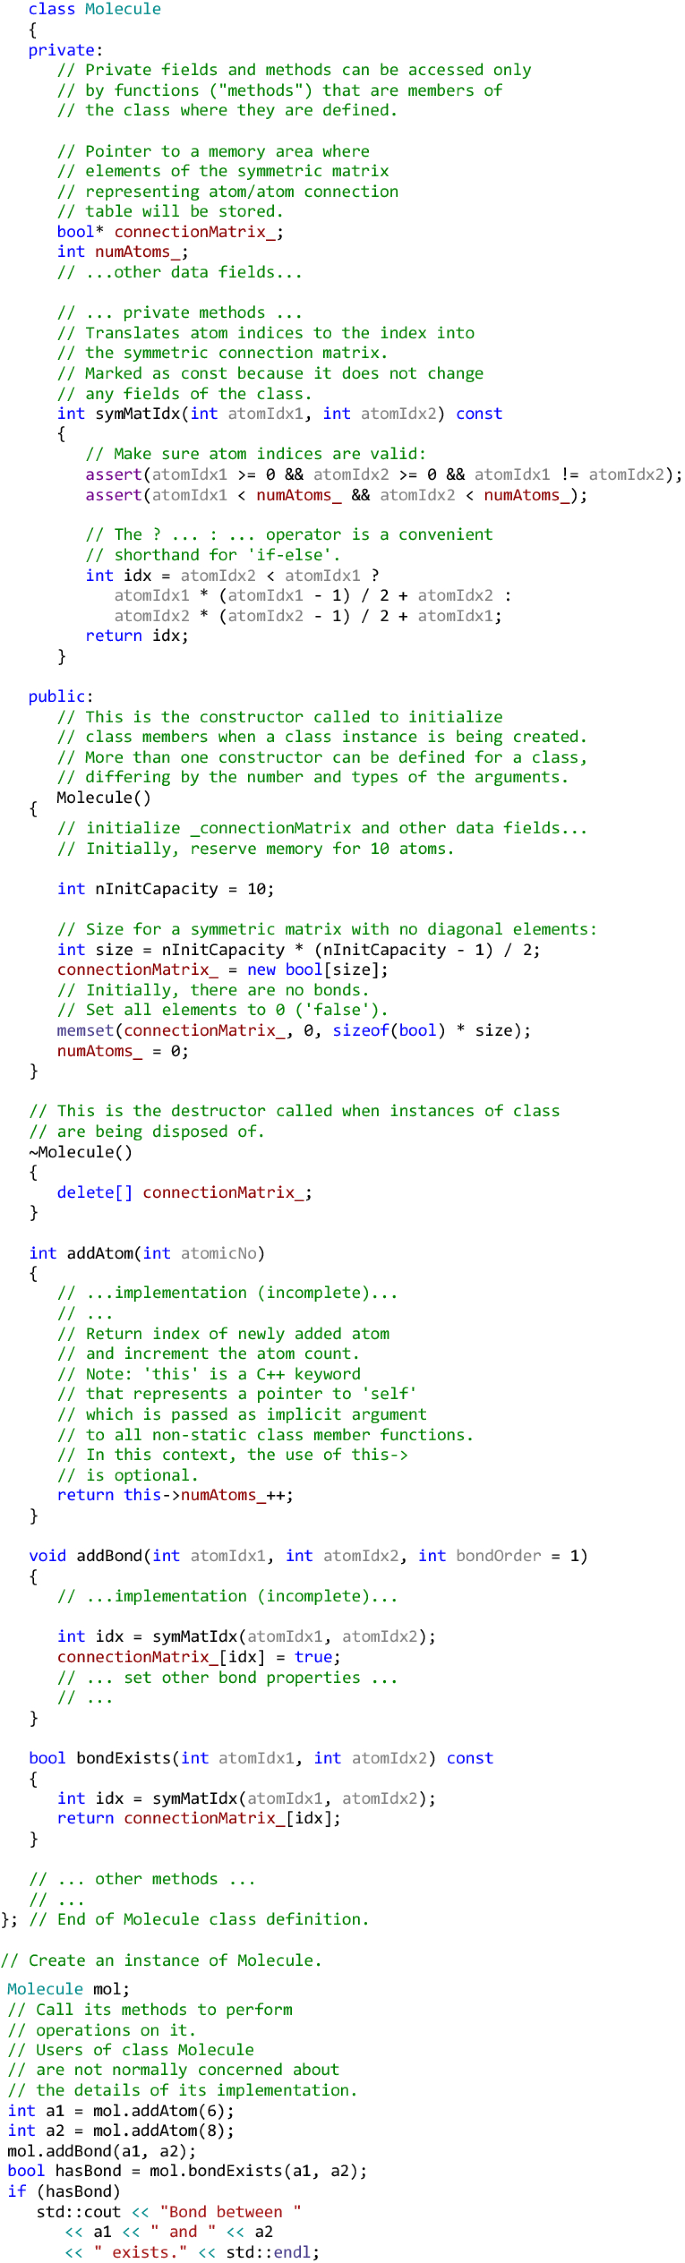 The C Programming Language In Cheminformatics And Computational Chemistry Springerlink